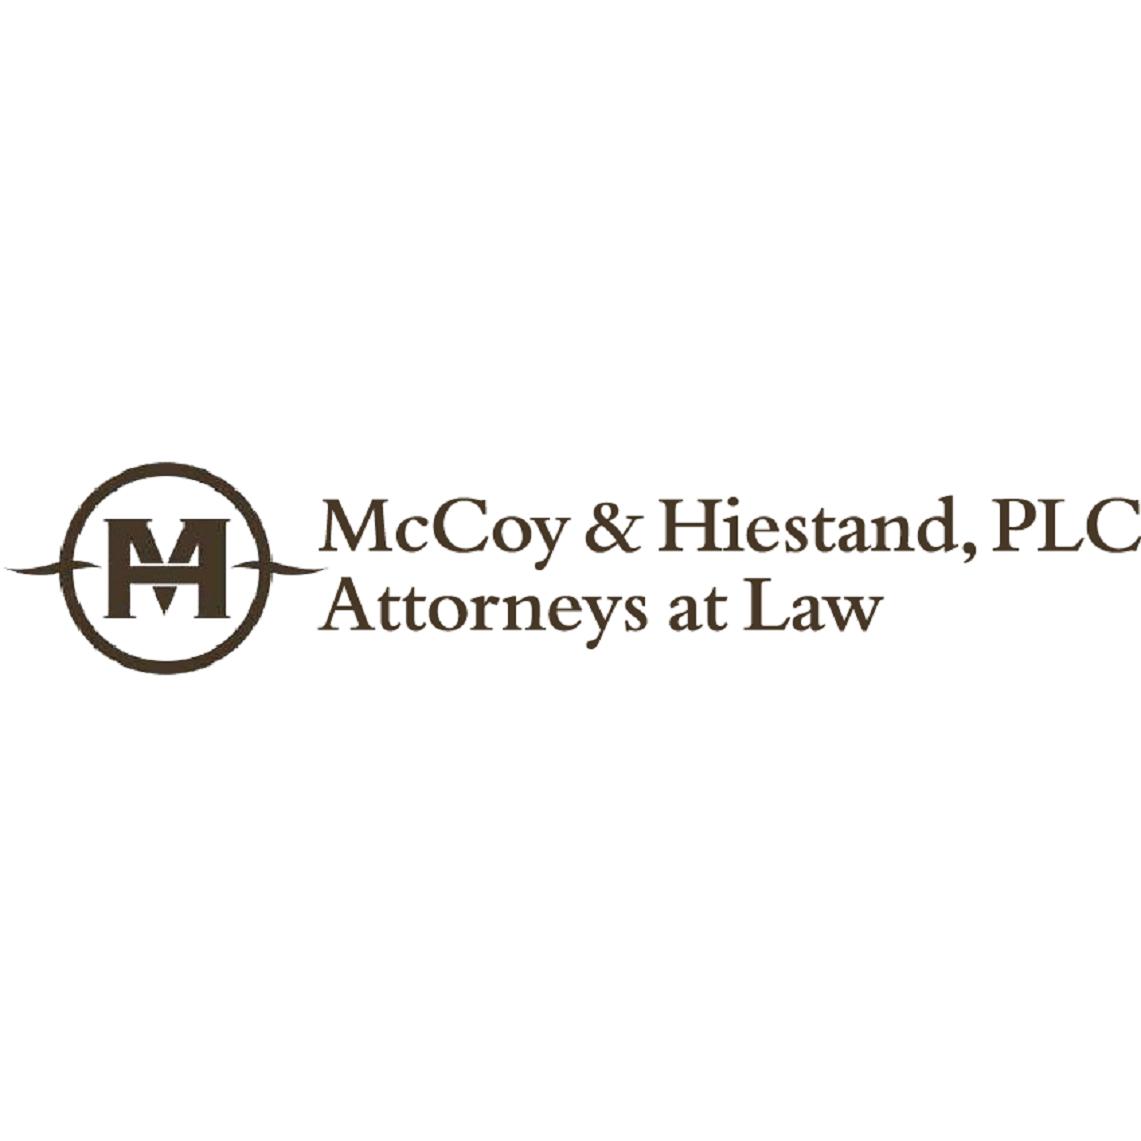 McCoy & Hiestand, PLC